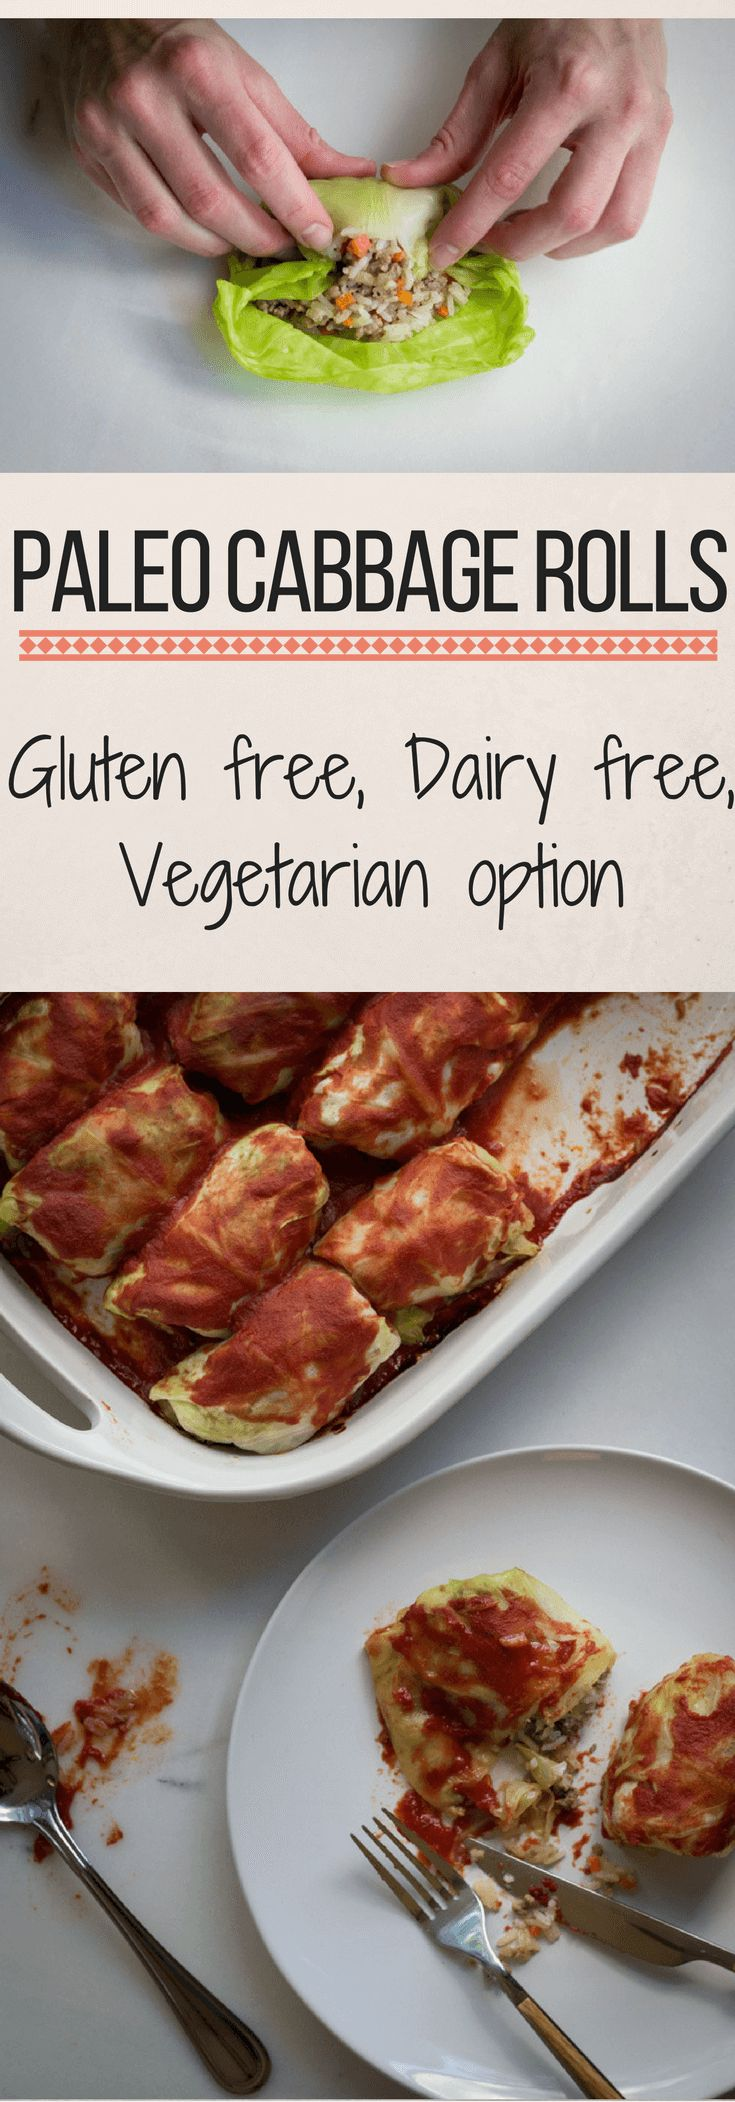 Paleo recipes / gluten free recipes / grain free recipes / dairy free recipes / family recipe / make ahead / comfort food / cabbage rolls